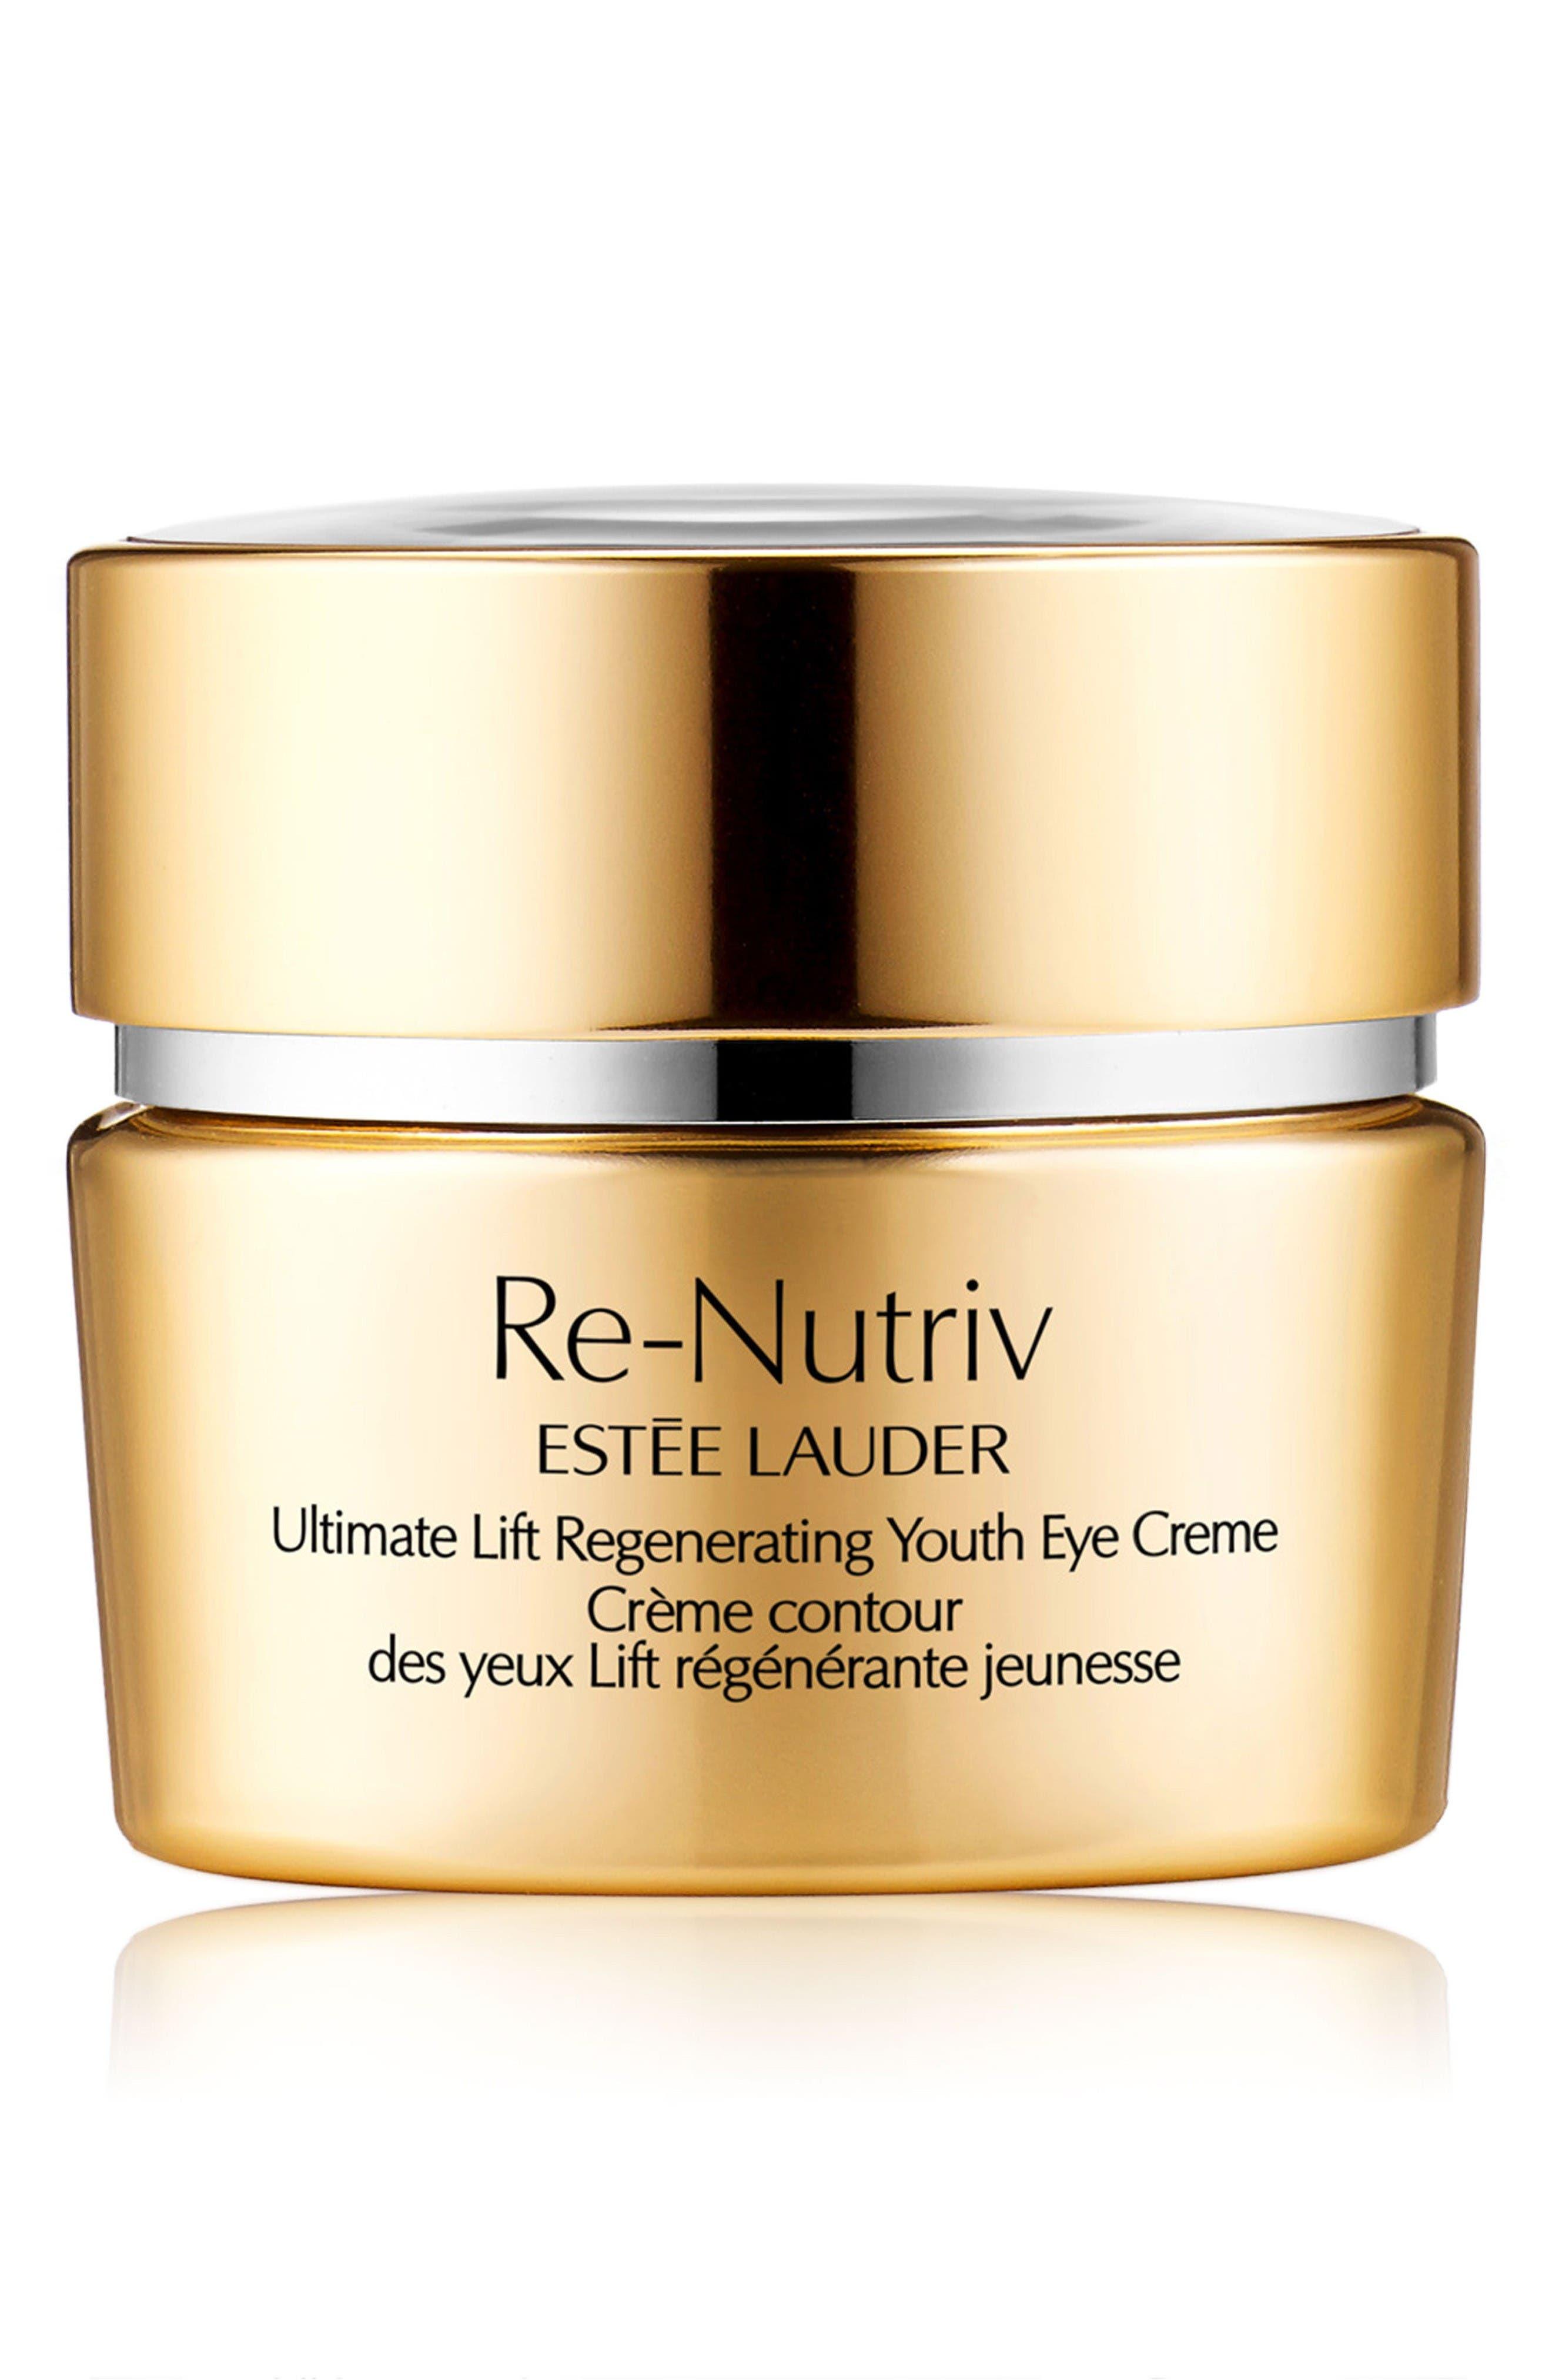 Re-Nutriv Ultimate Lift Regenerating Youth Eye Creme,                         Main,                         color, No Color